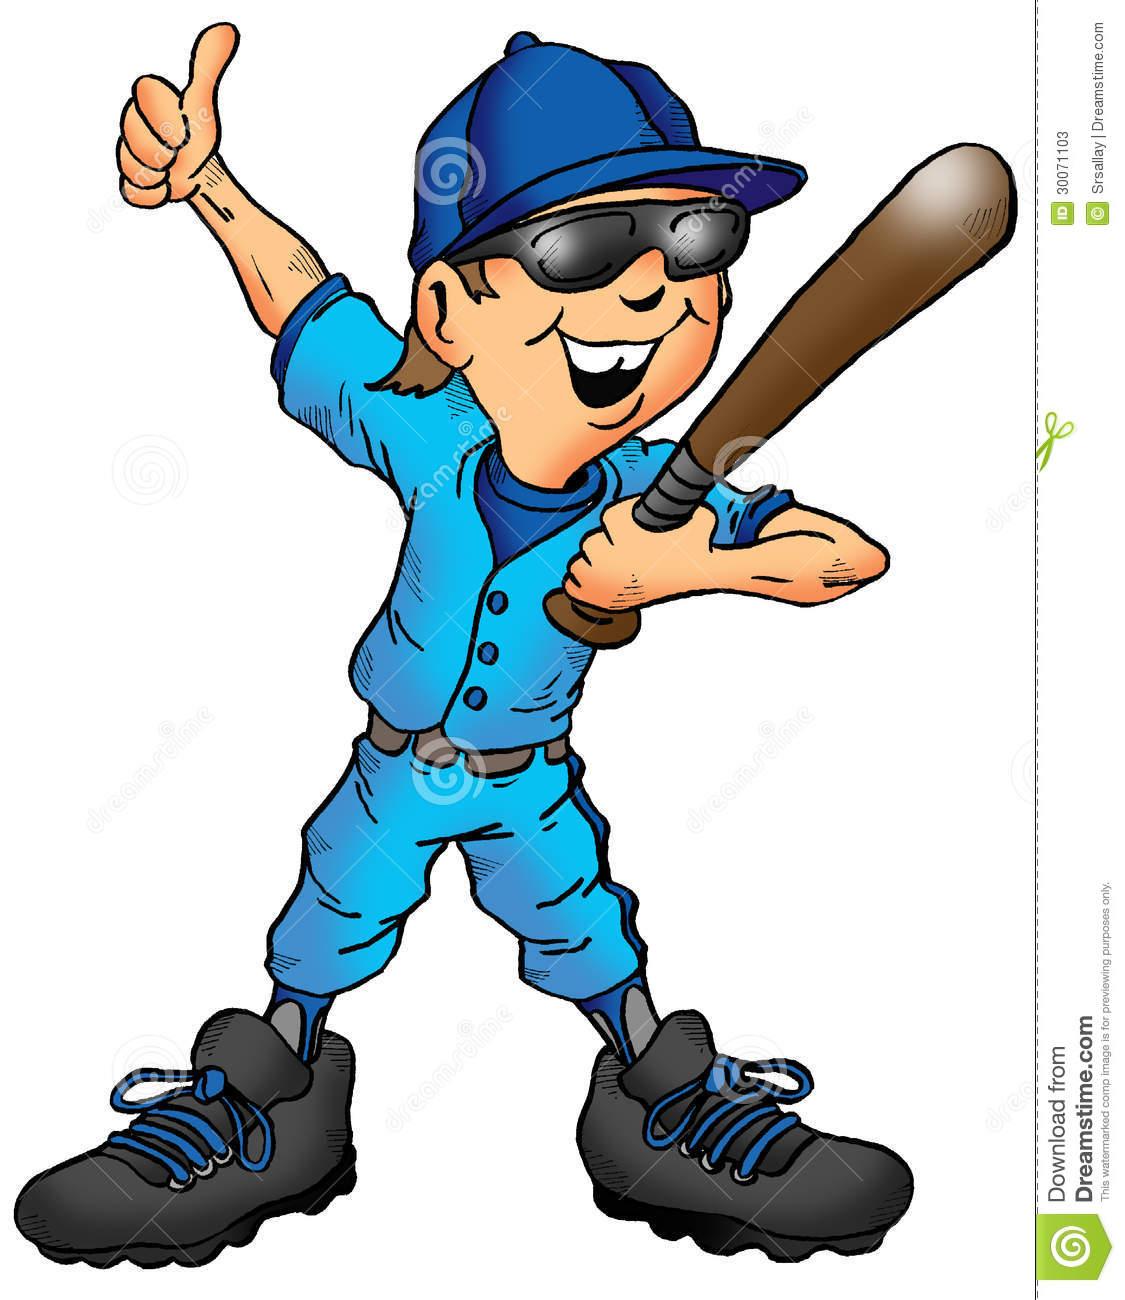 free clipart of baseball players - photo #50